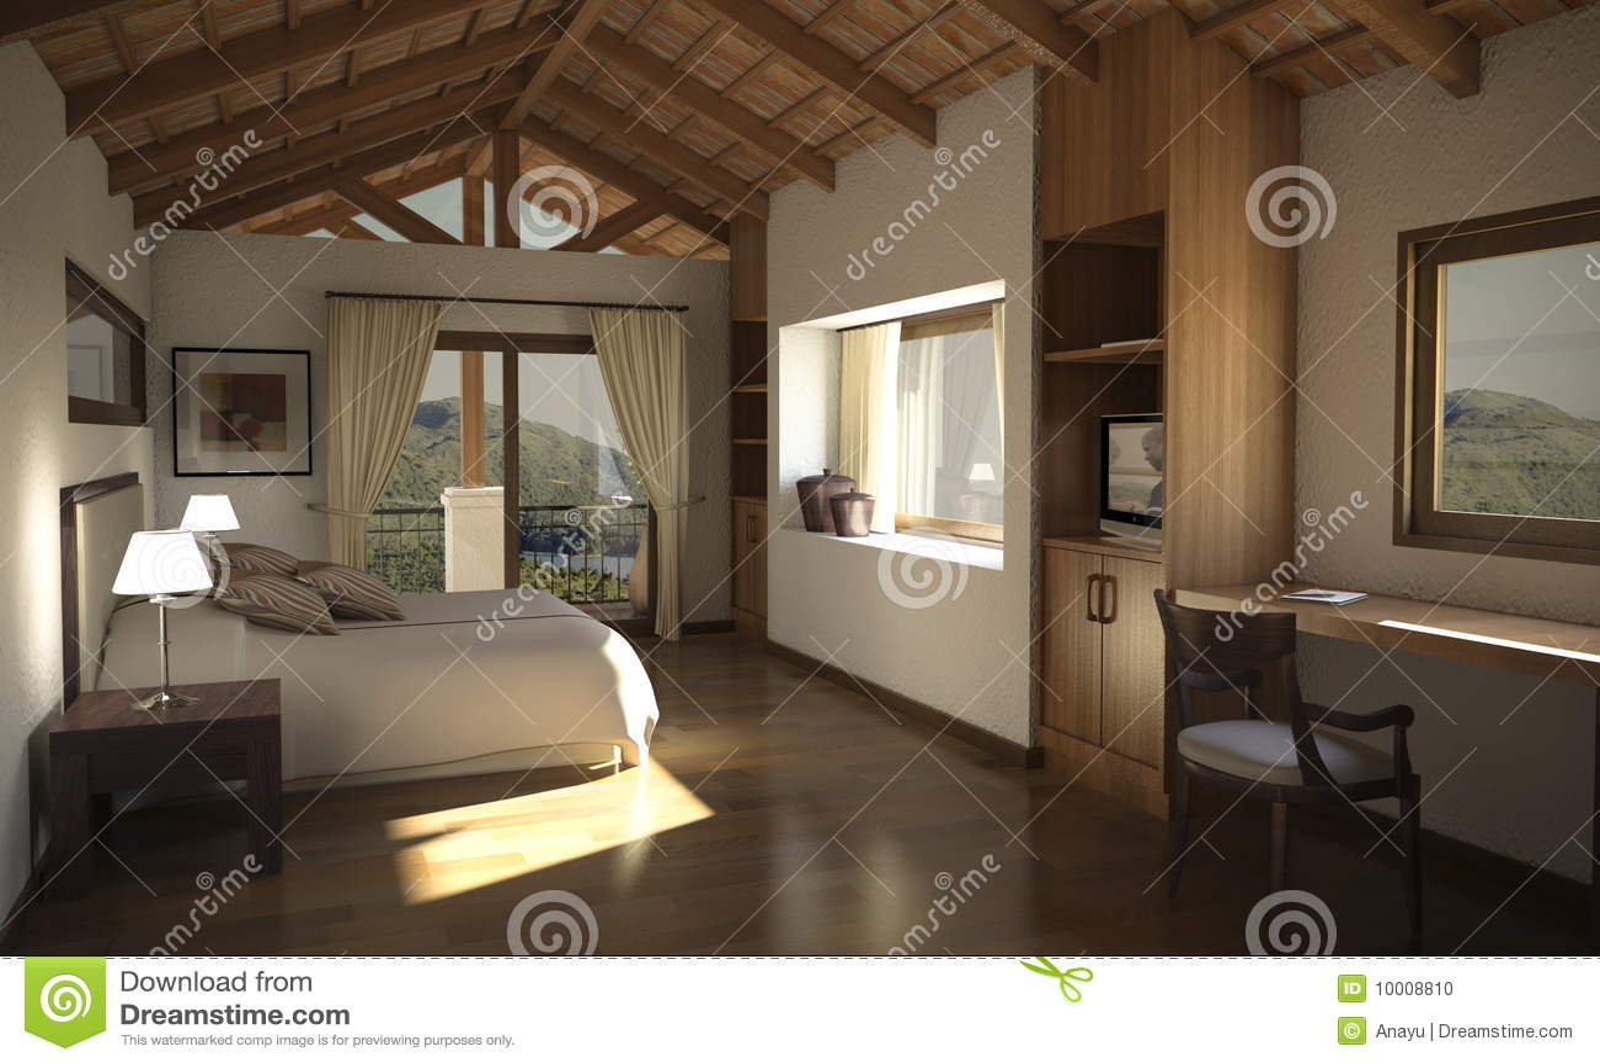 Digital interior of a country house stock photo image for Interiores de casas